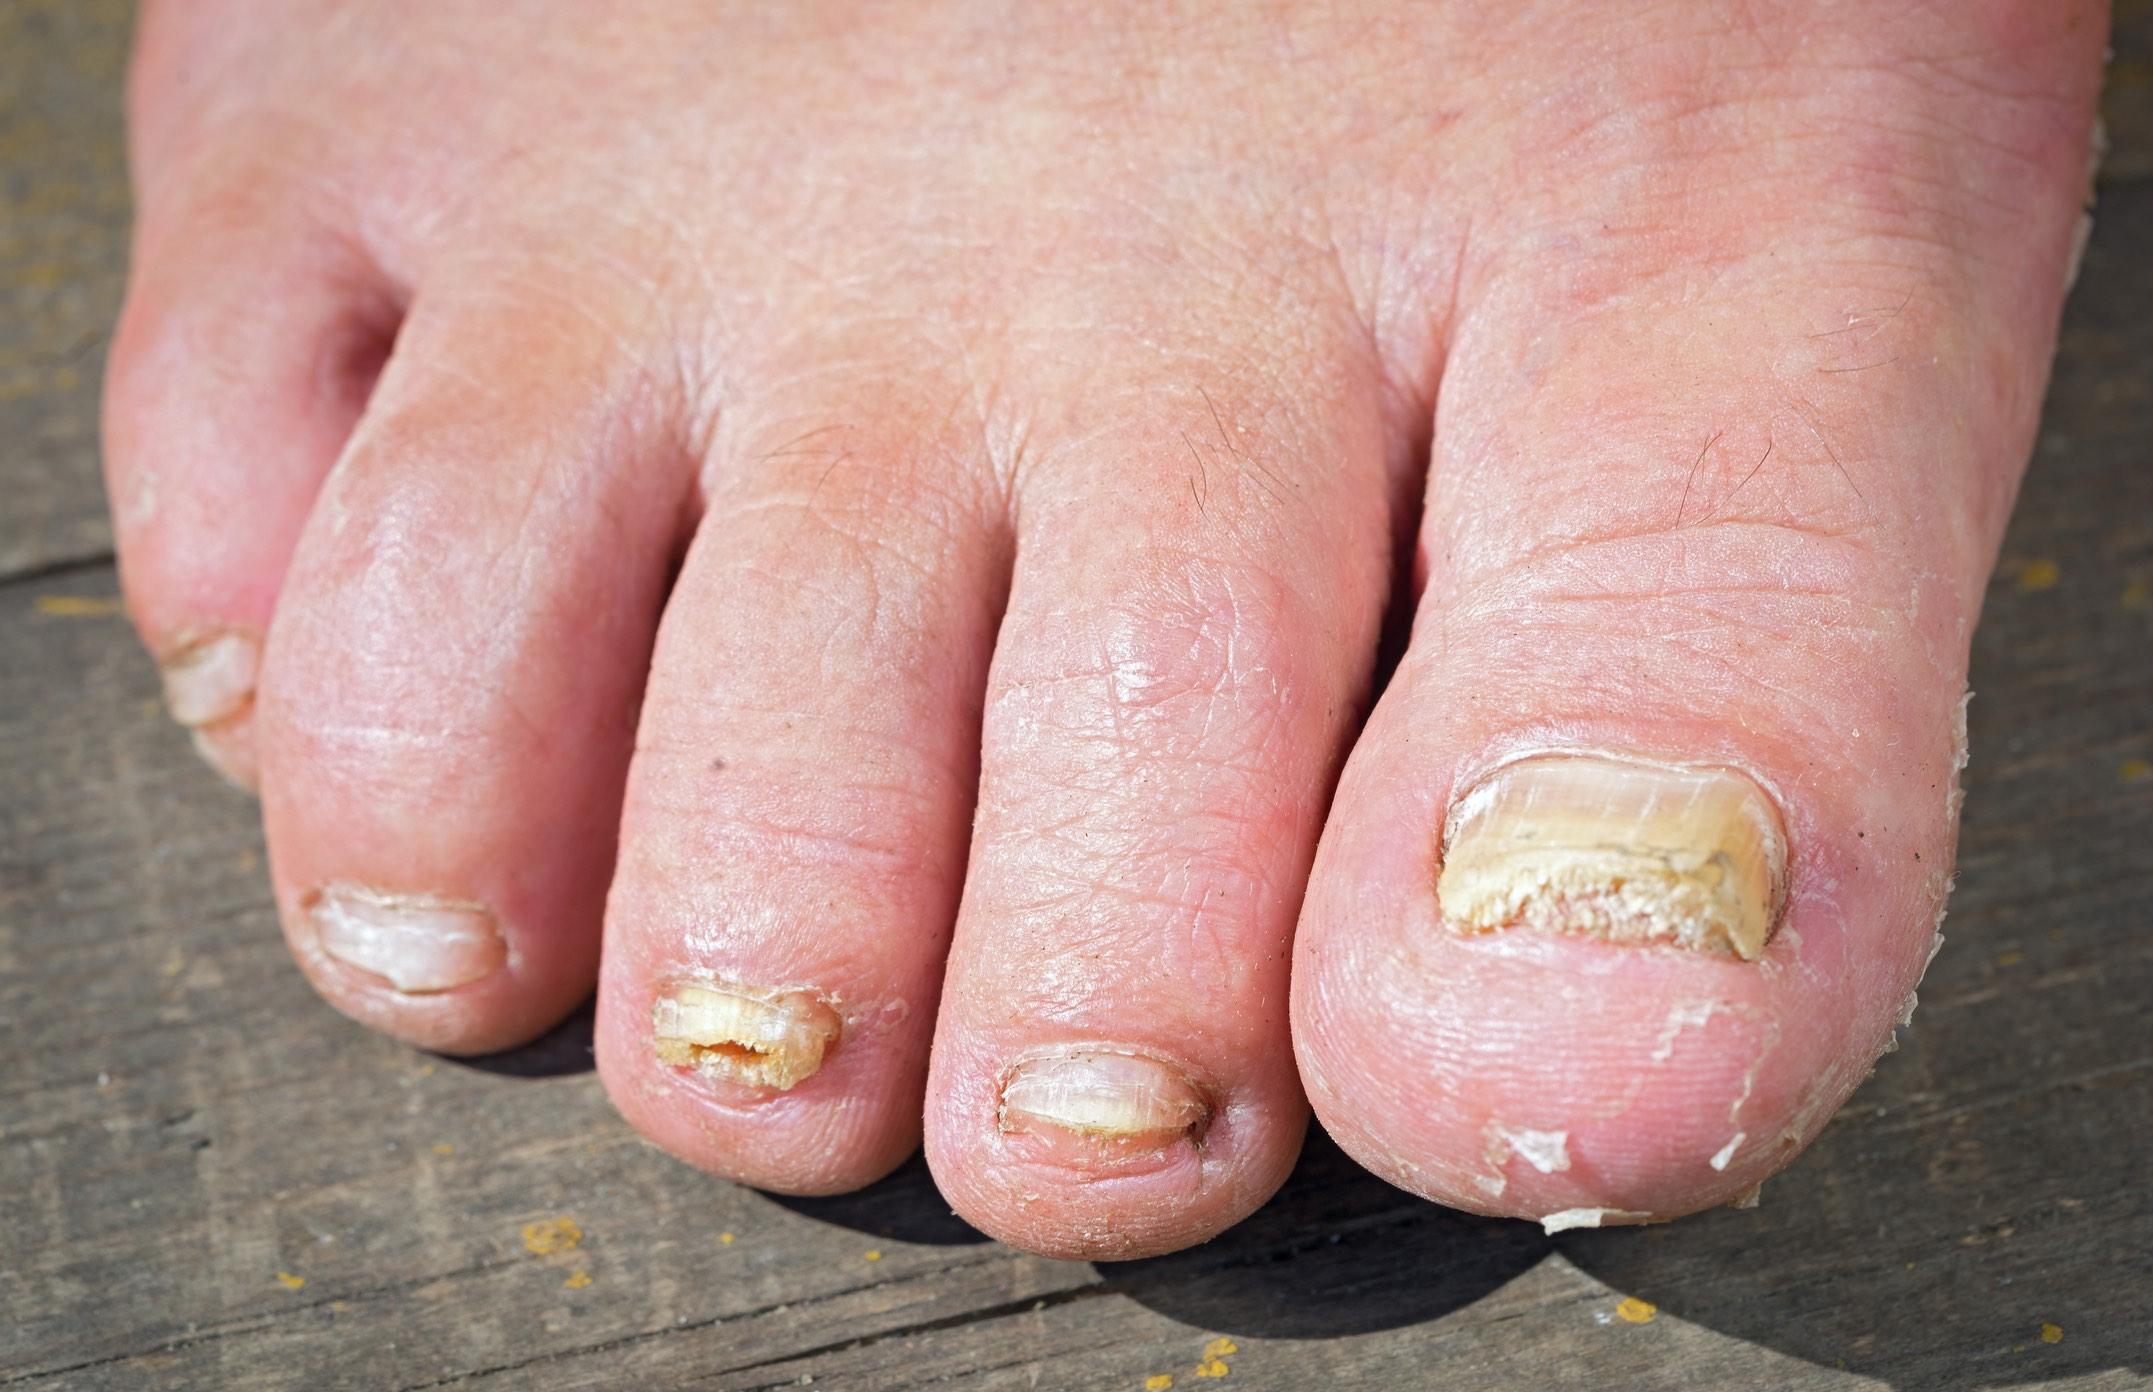 Foot and Toenail Fungus